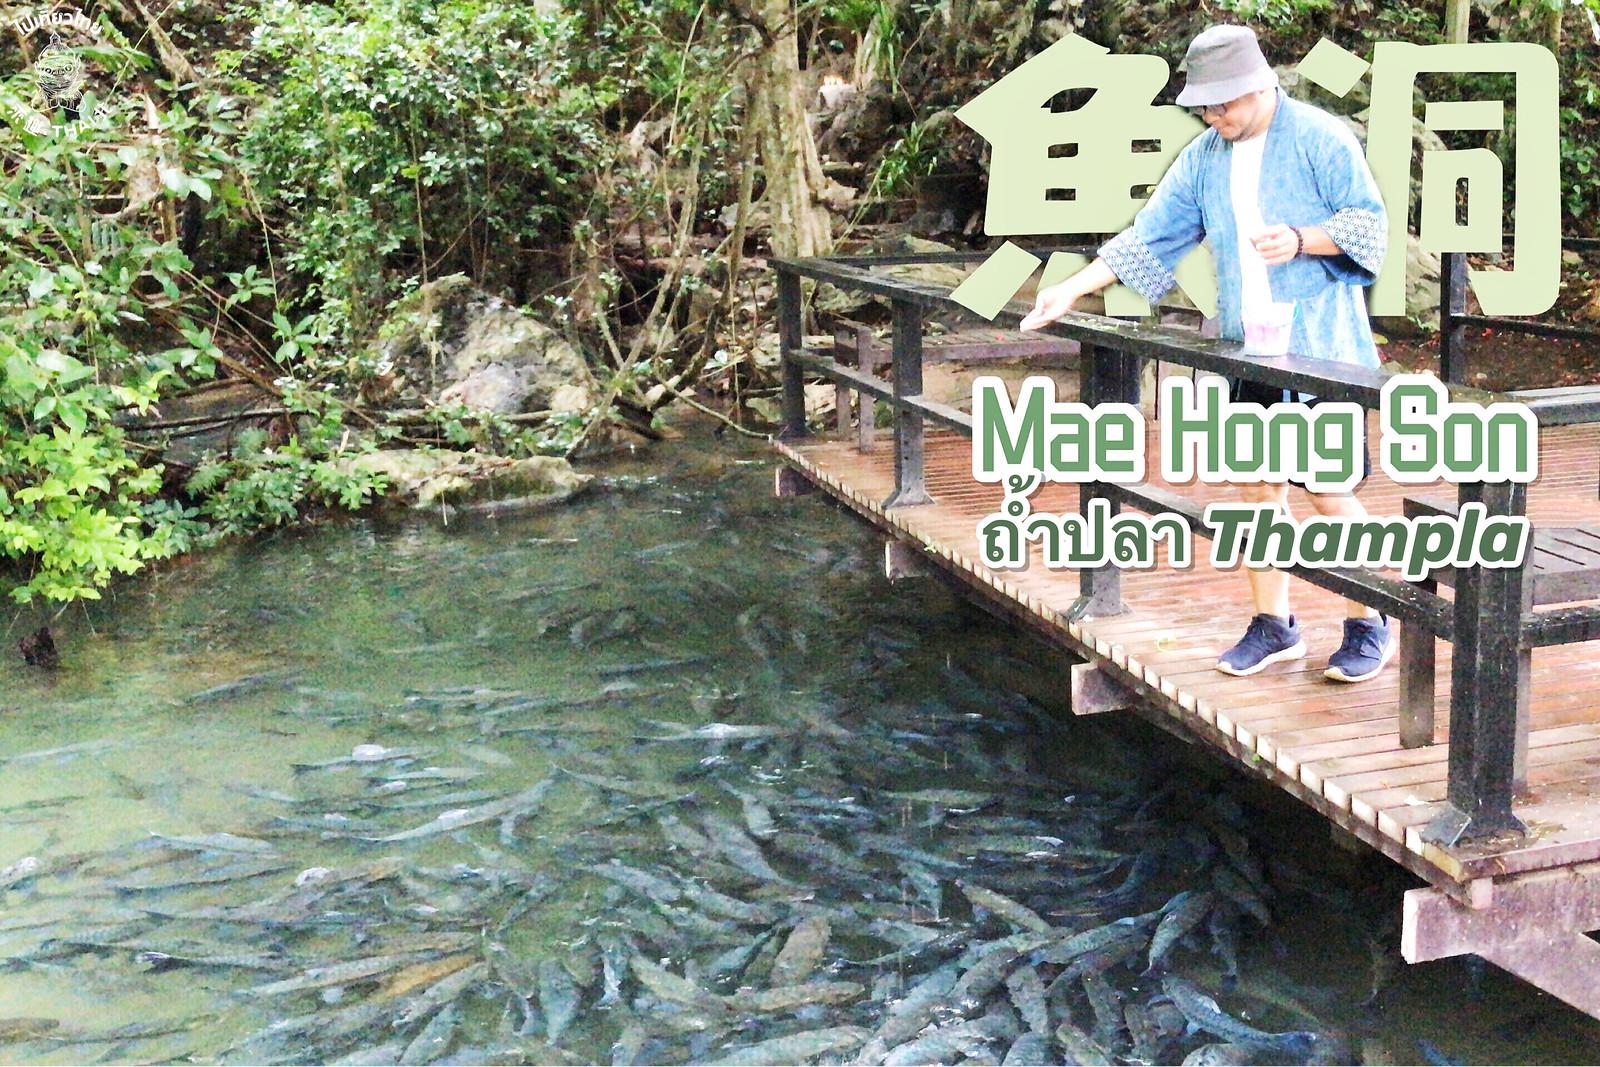 PhaSua國家公園《ถ้ำปลา。Thampla。魚洞》